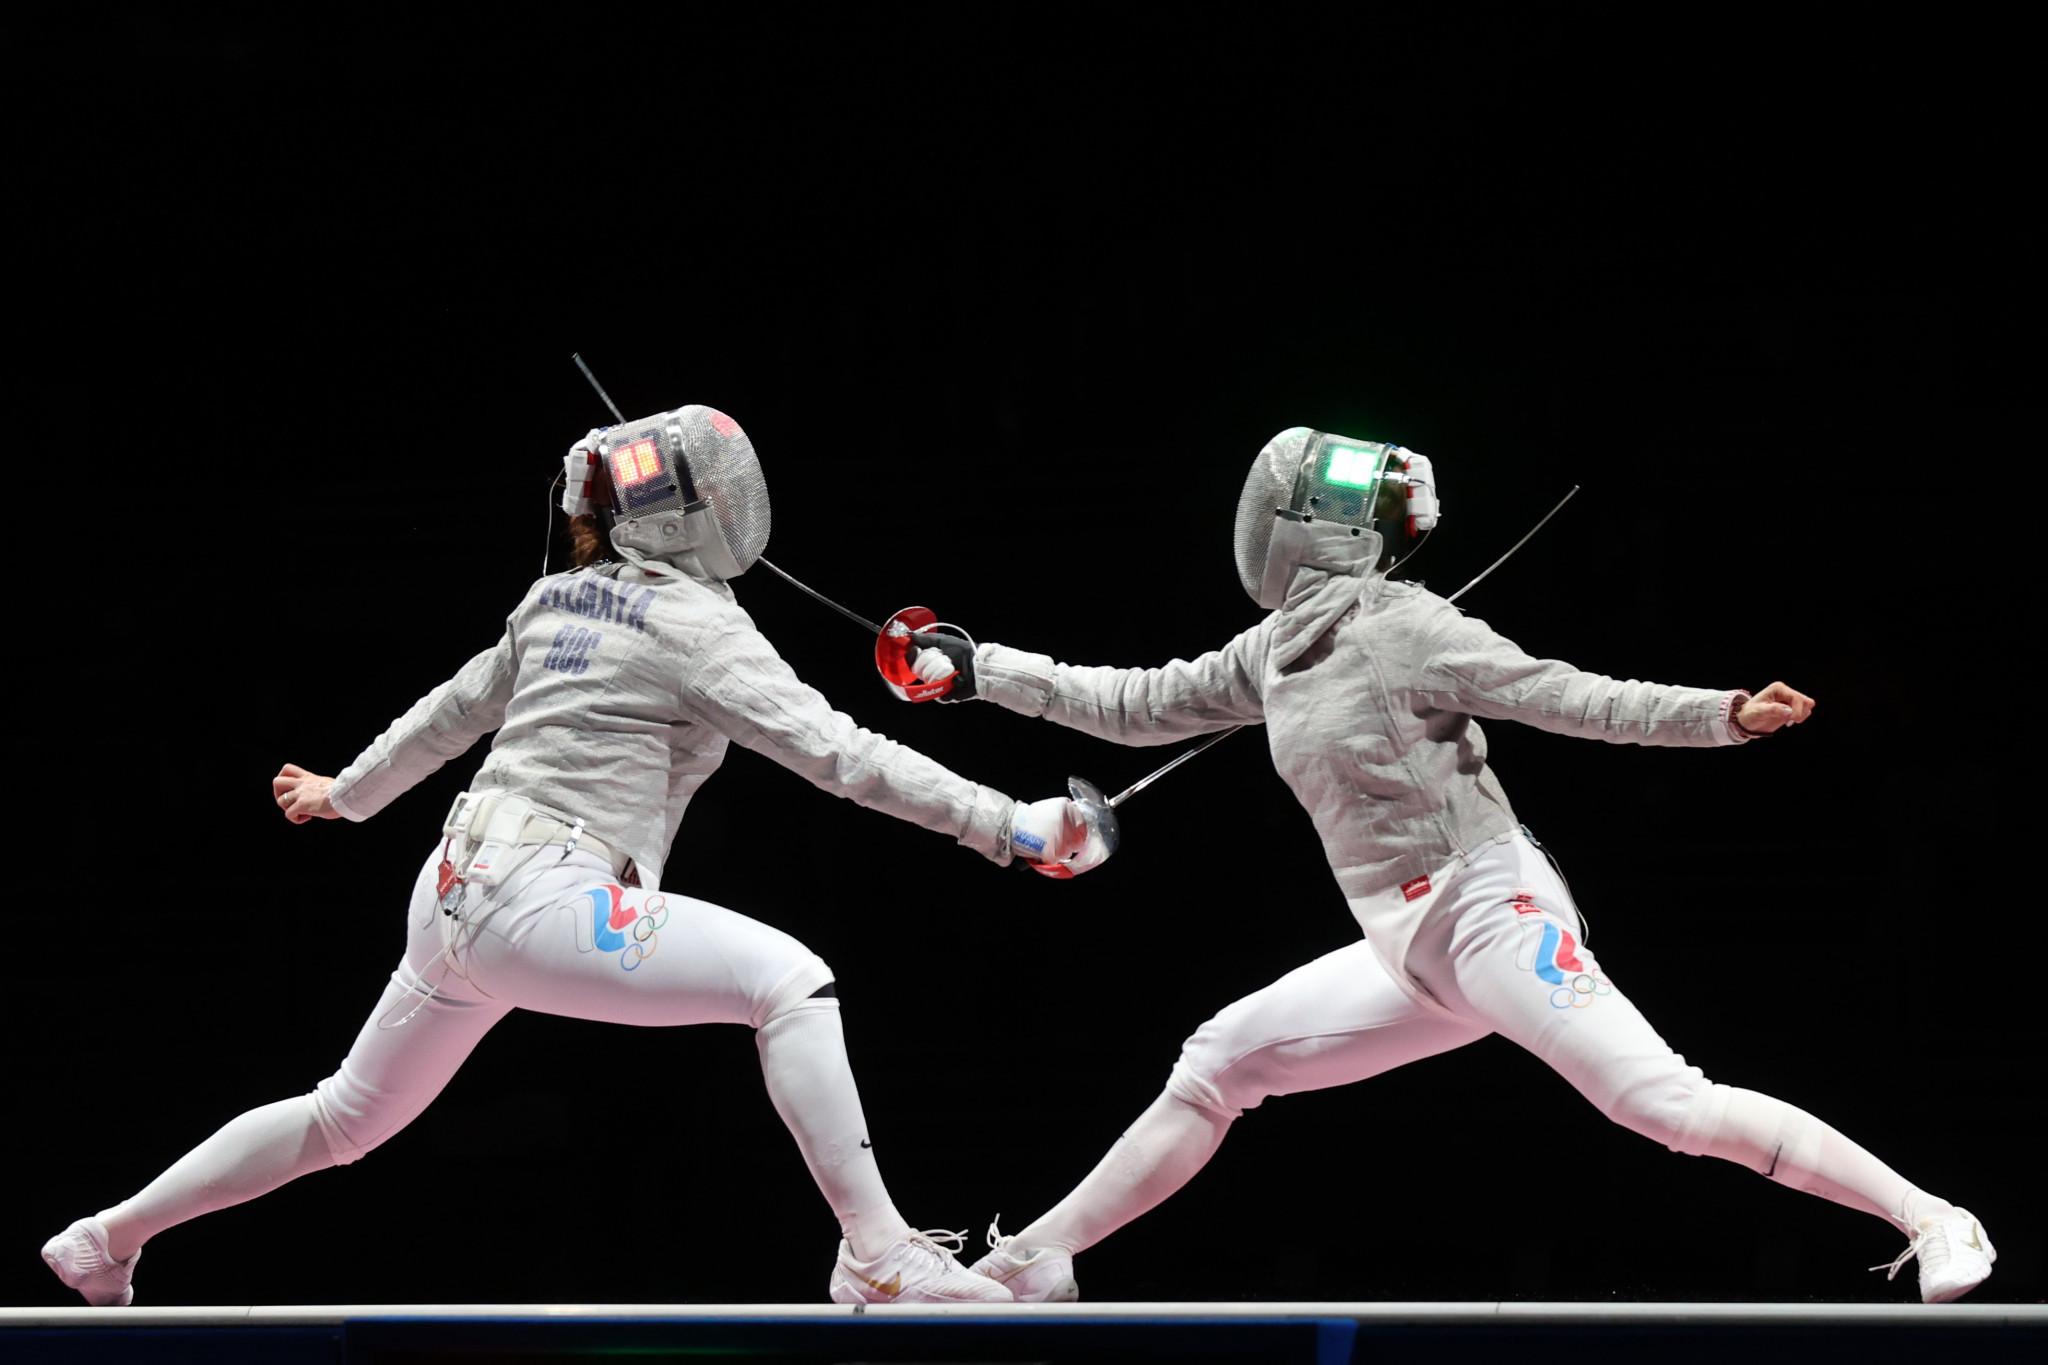 Sofia Pozdniakova, right, defeated compatriot Sofya Velikaya on her way to Olympic glory in Tokyo ©Getty Images